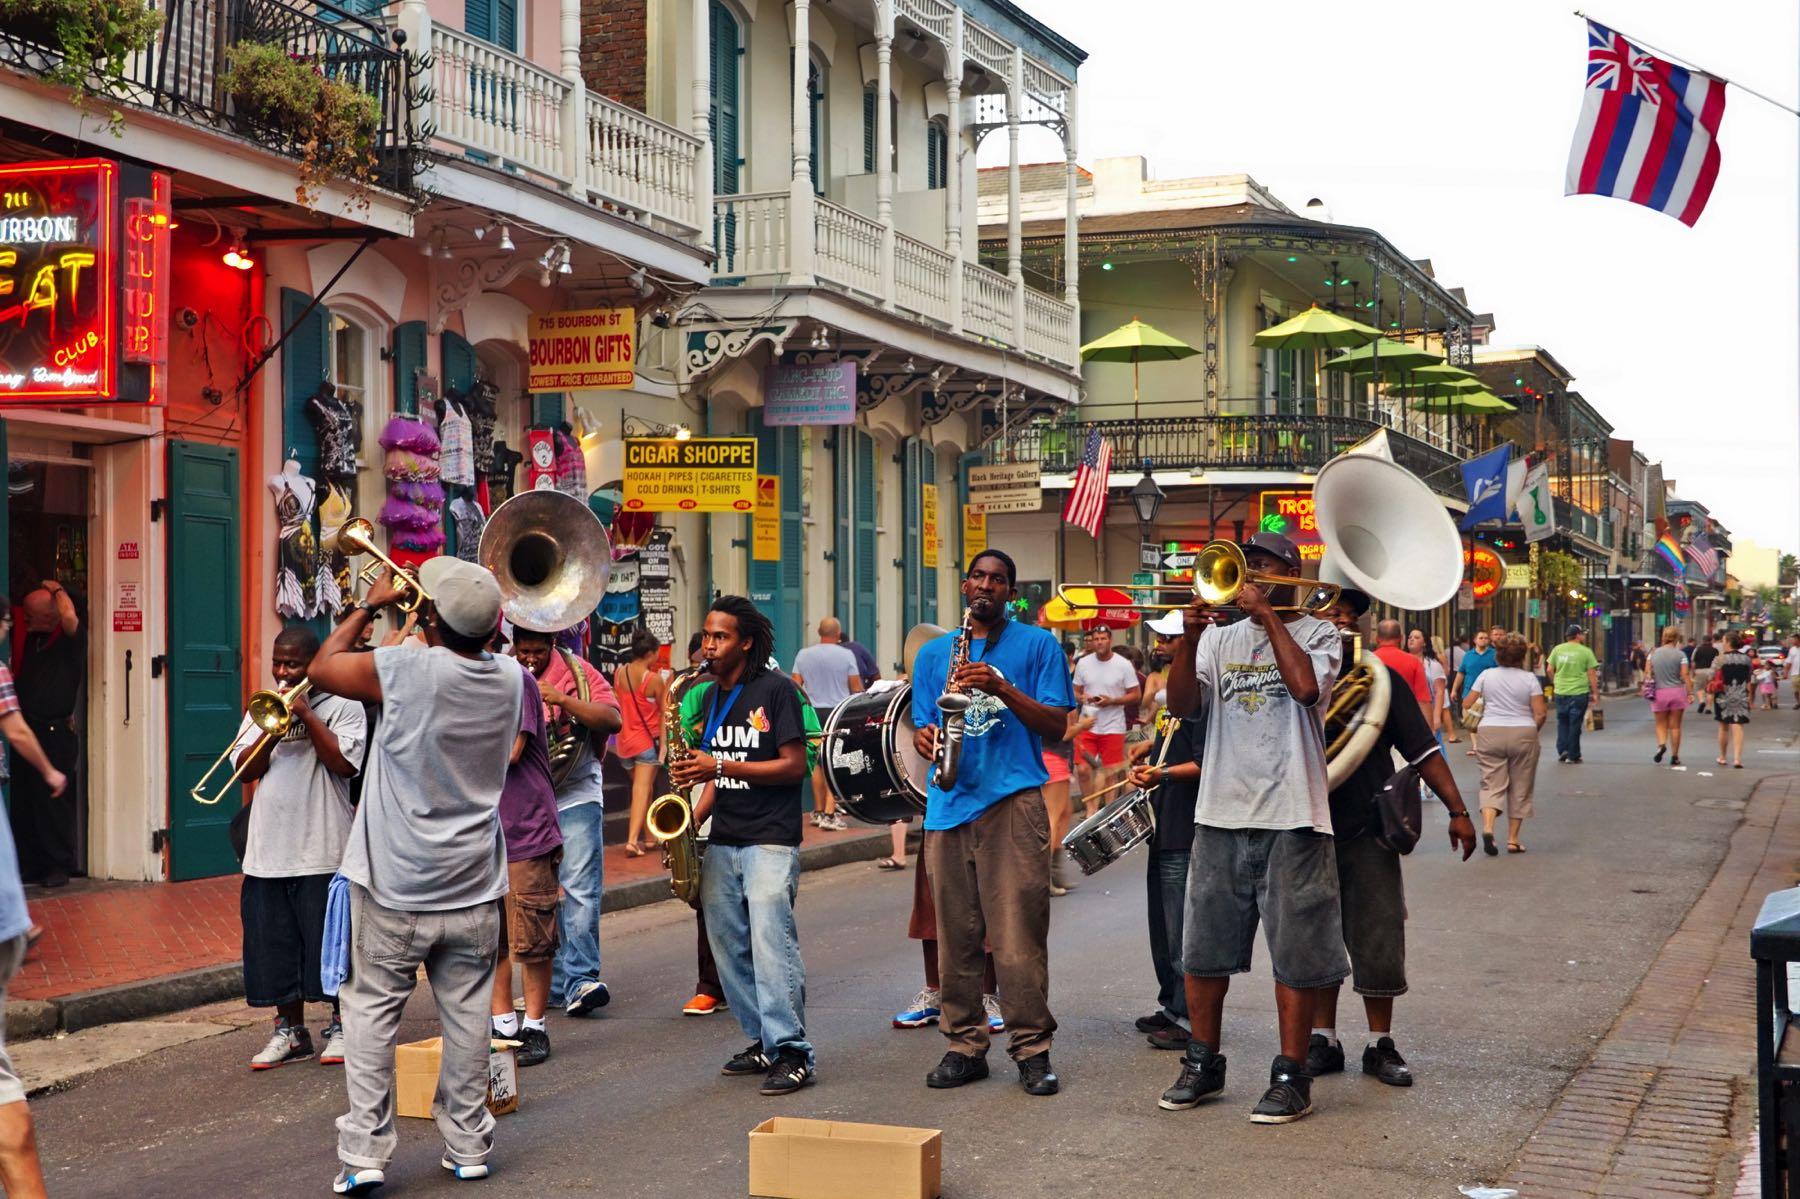 10 Best Hotels On Bourbon Street, New Orleans